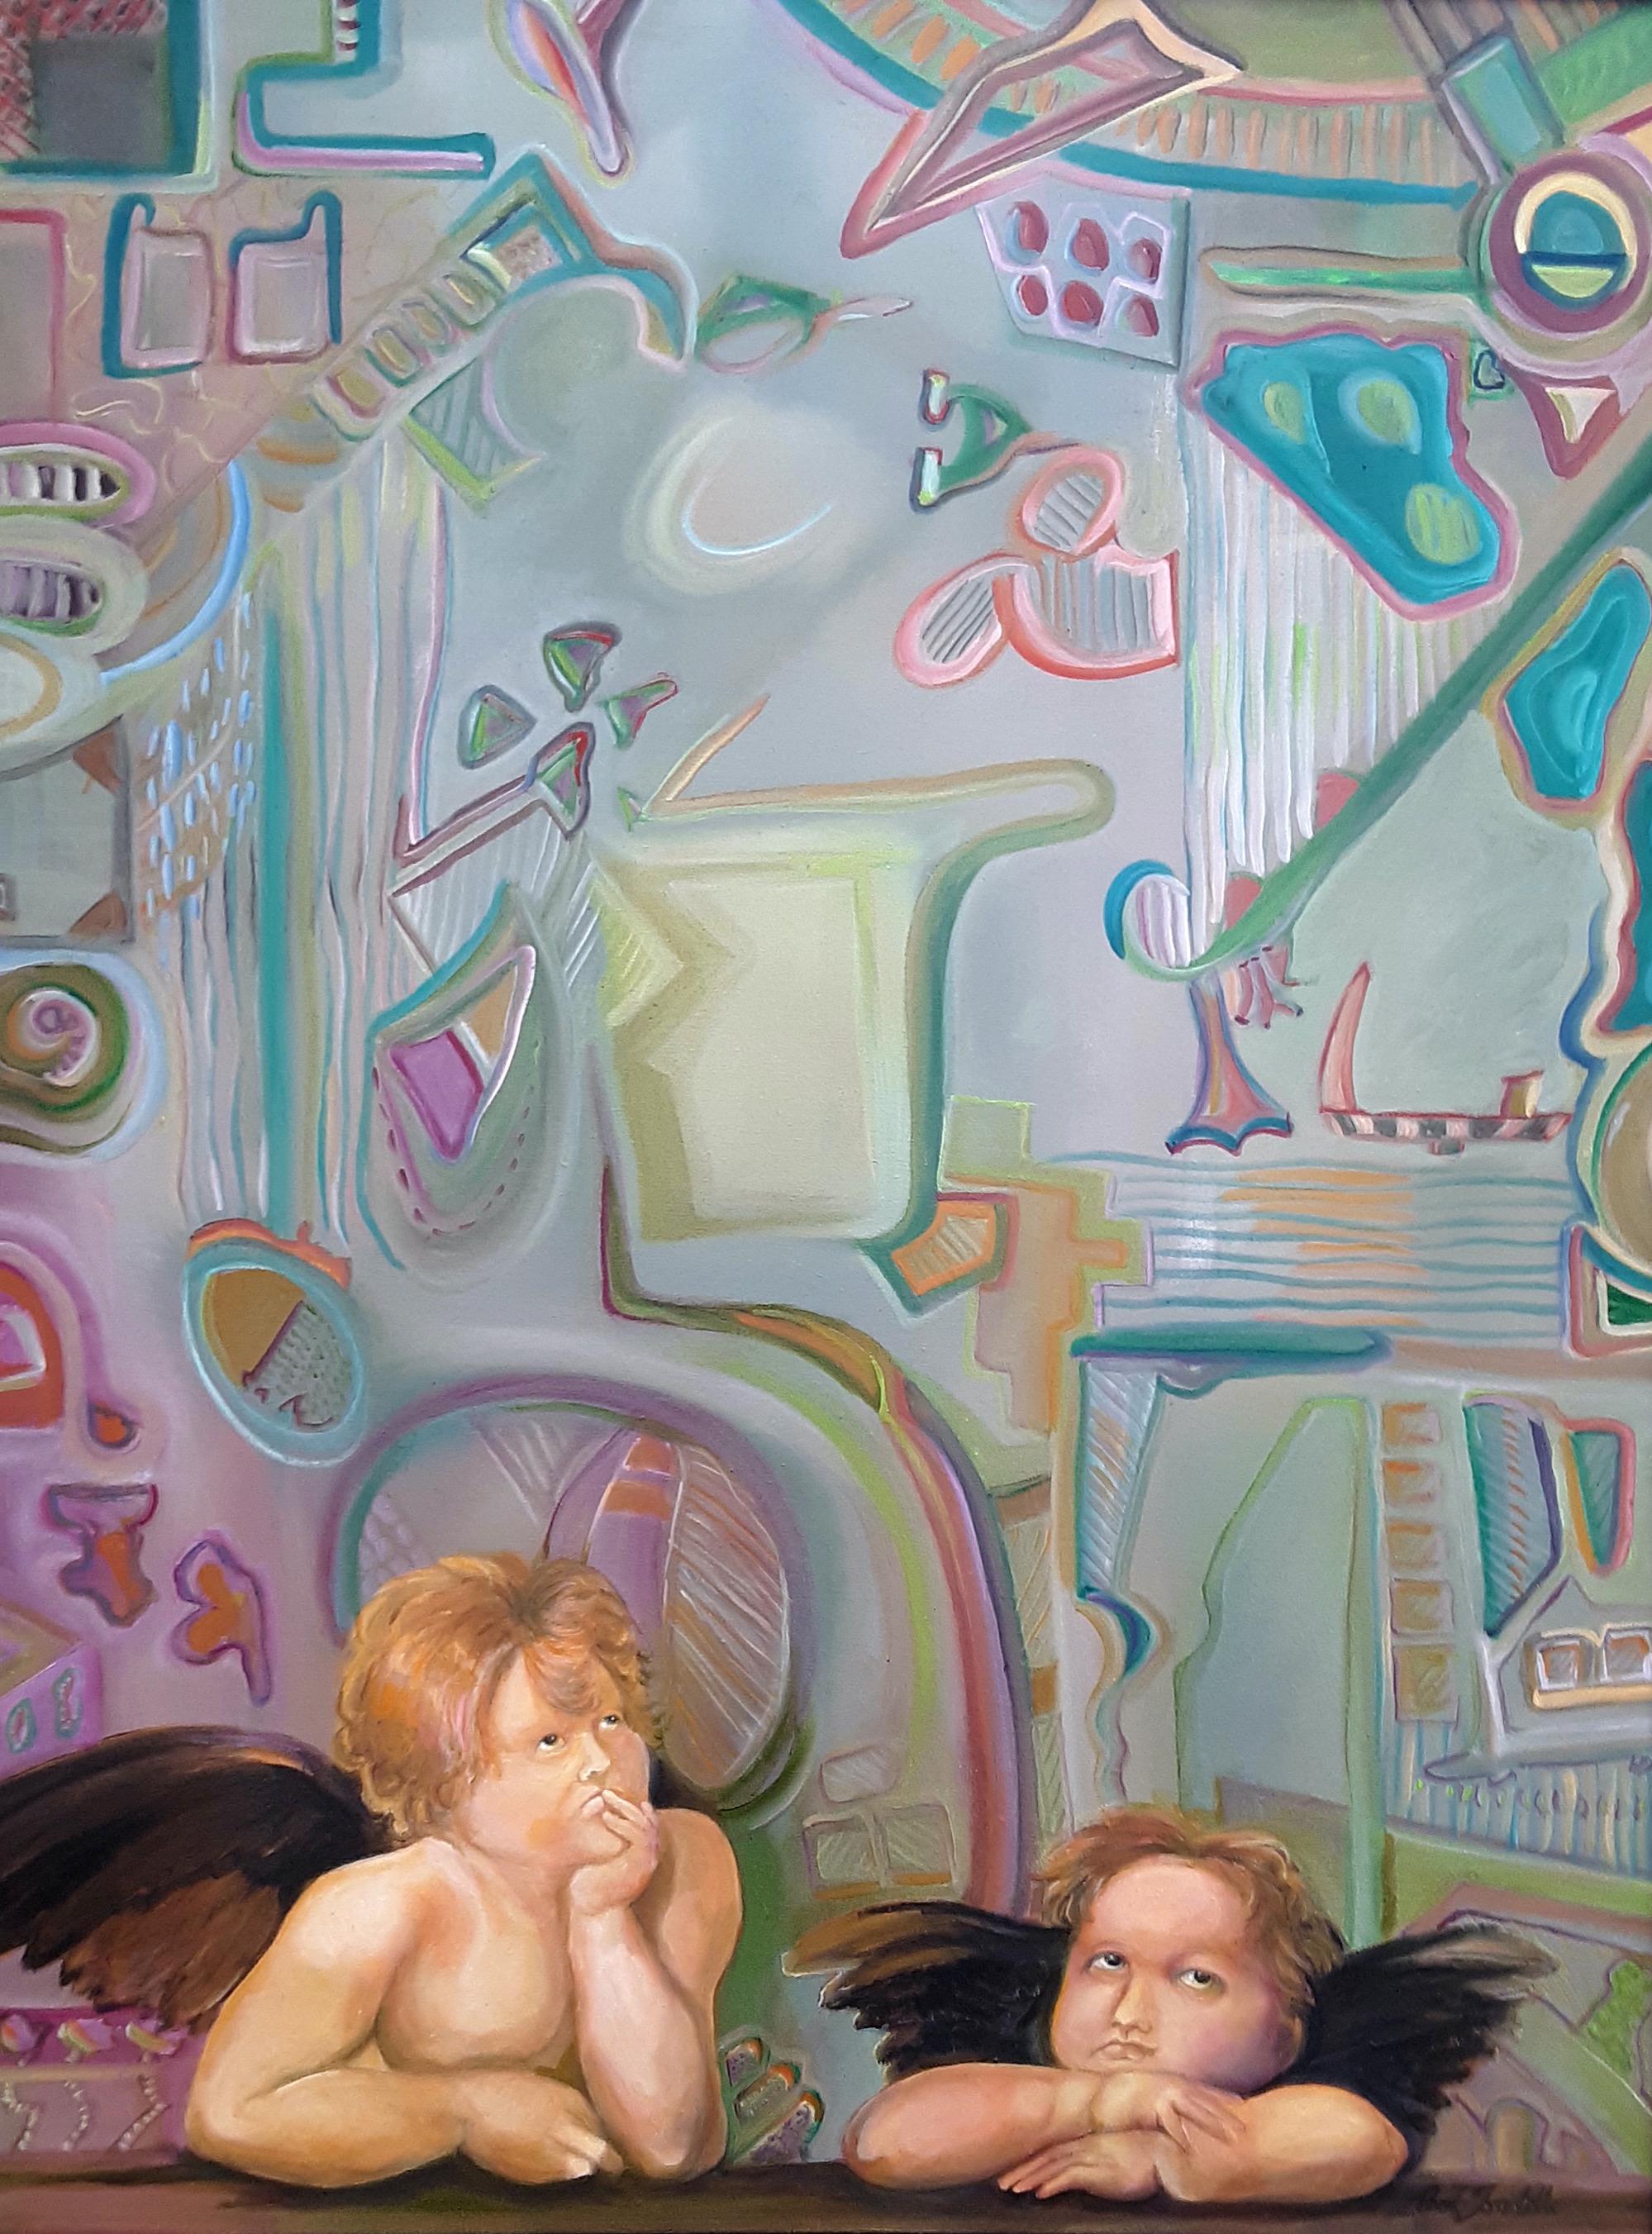 Raphaels cherubs pondering the abstract q6vvwh